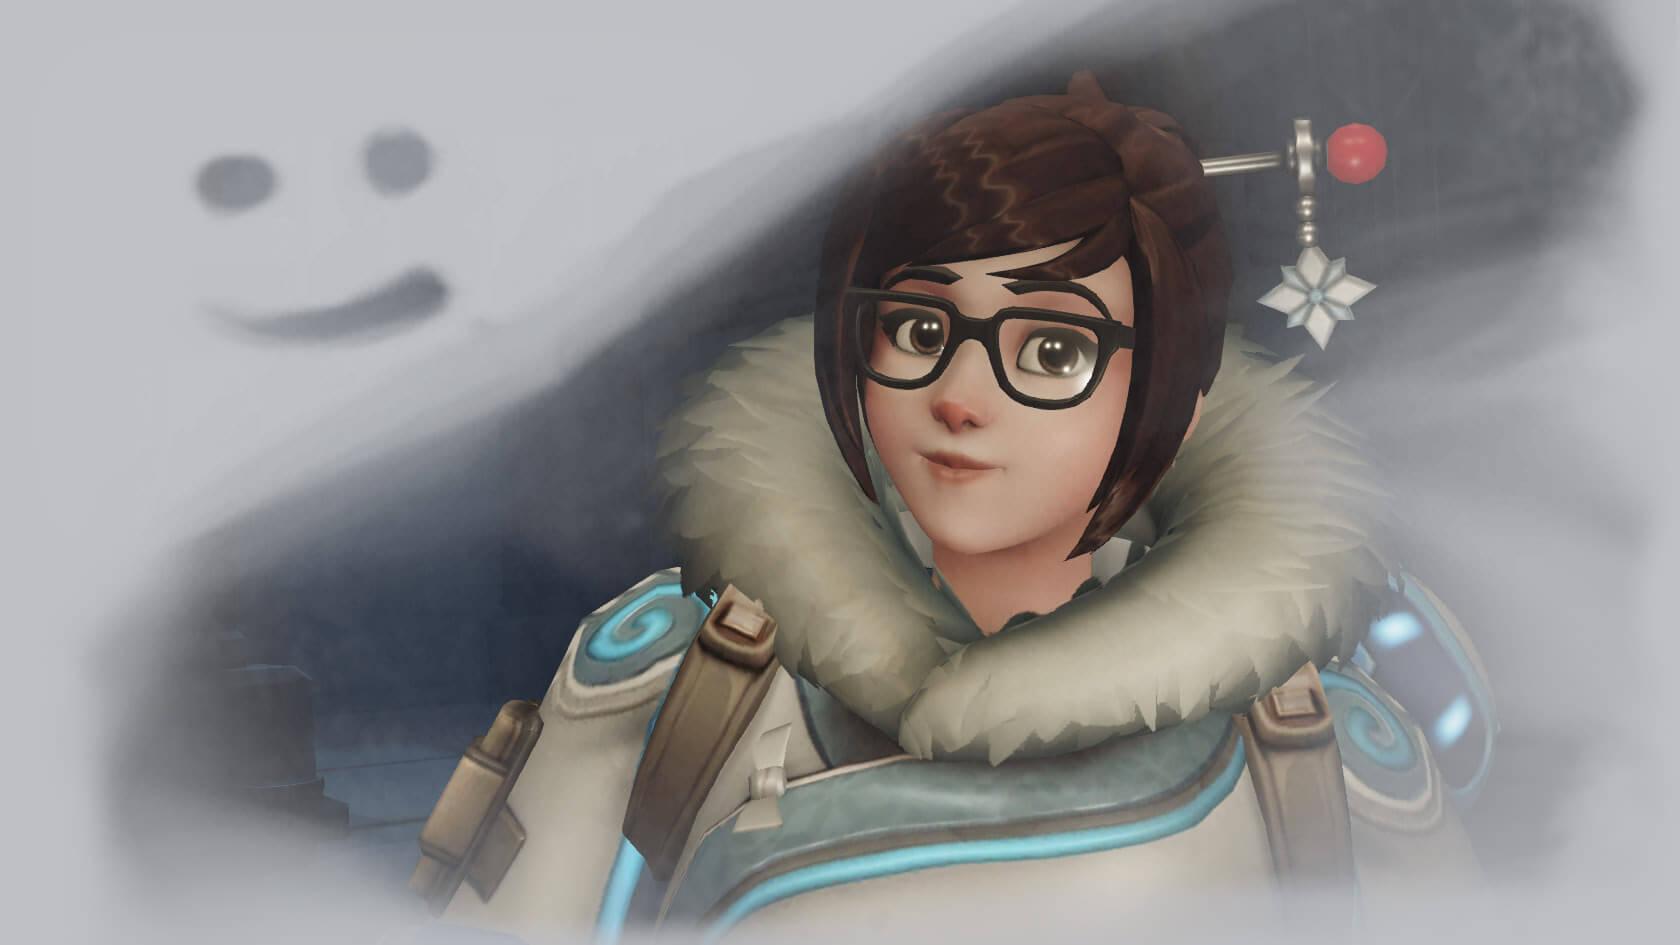 Overwatch Mei Freeze Smile